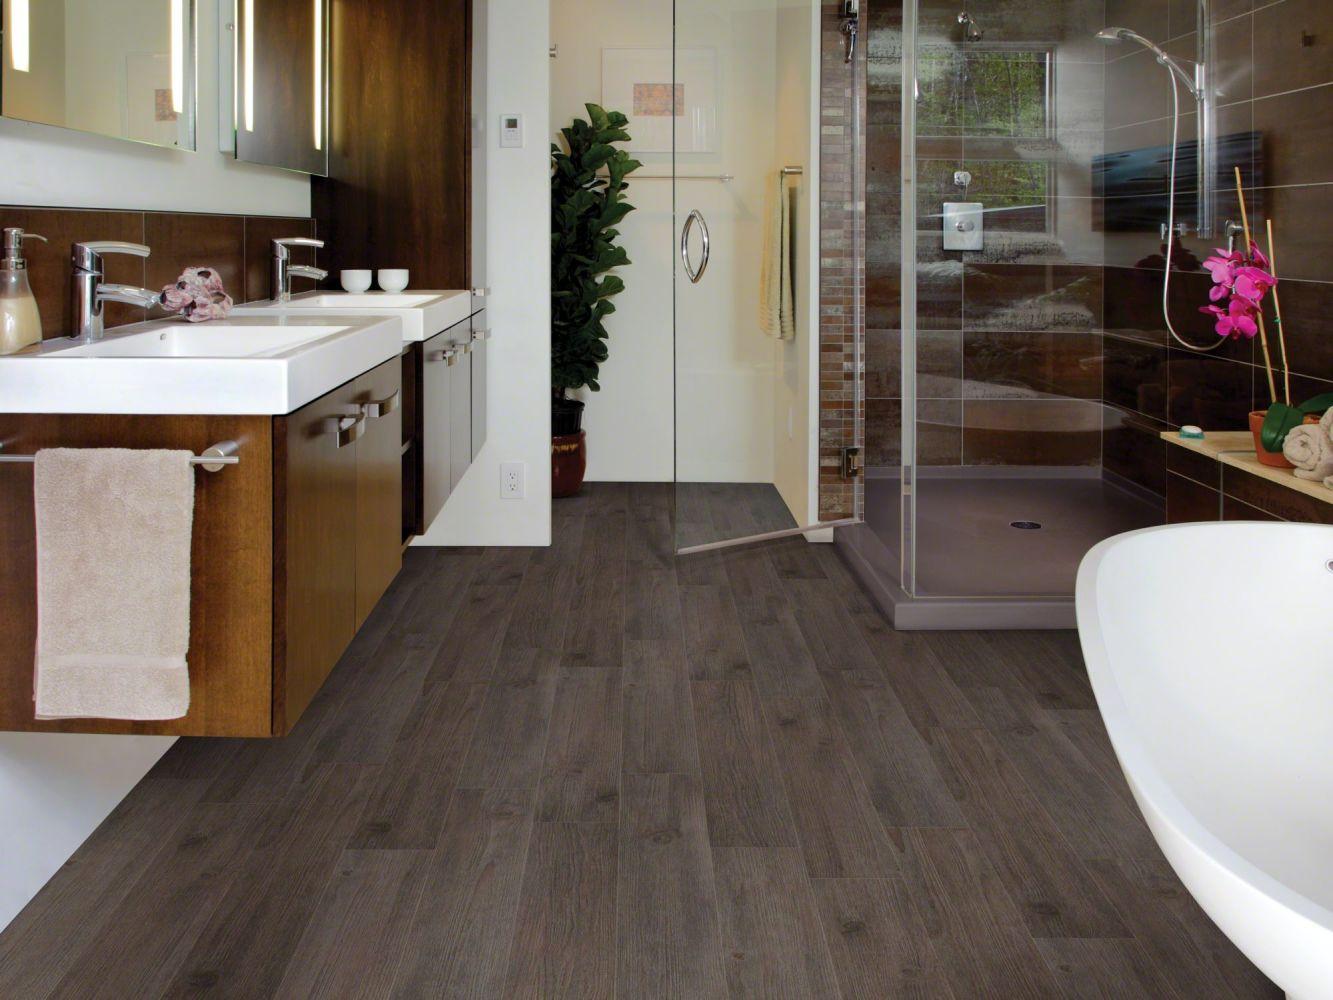 Philadelphia Commercial Resilient Residential Personality 20 Skyline 00759_5442V